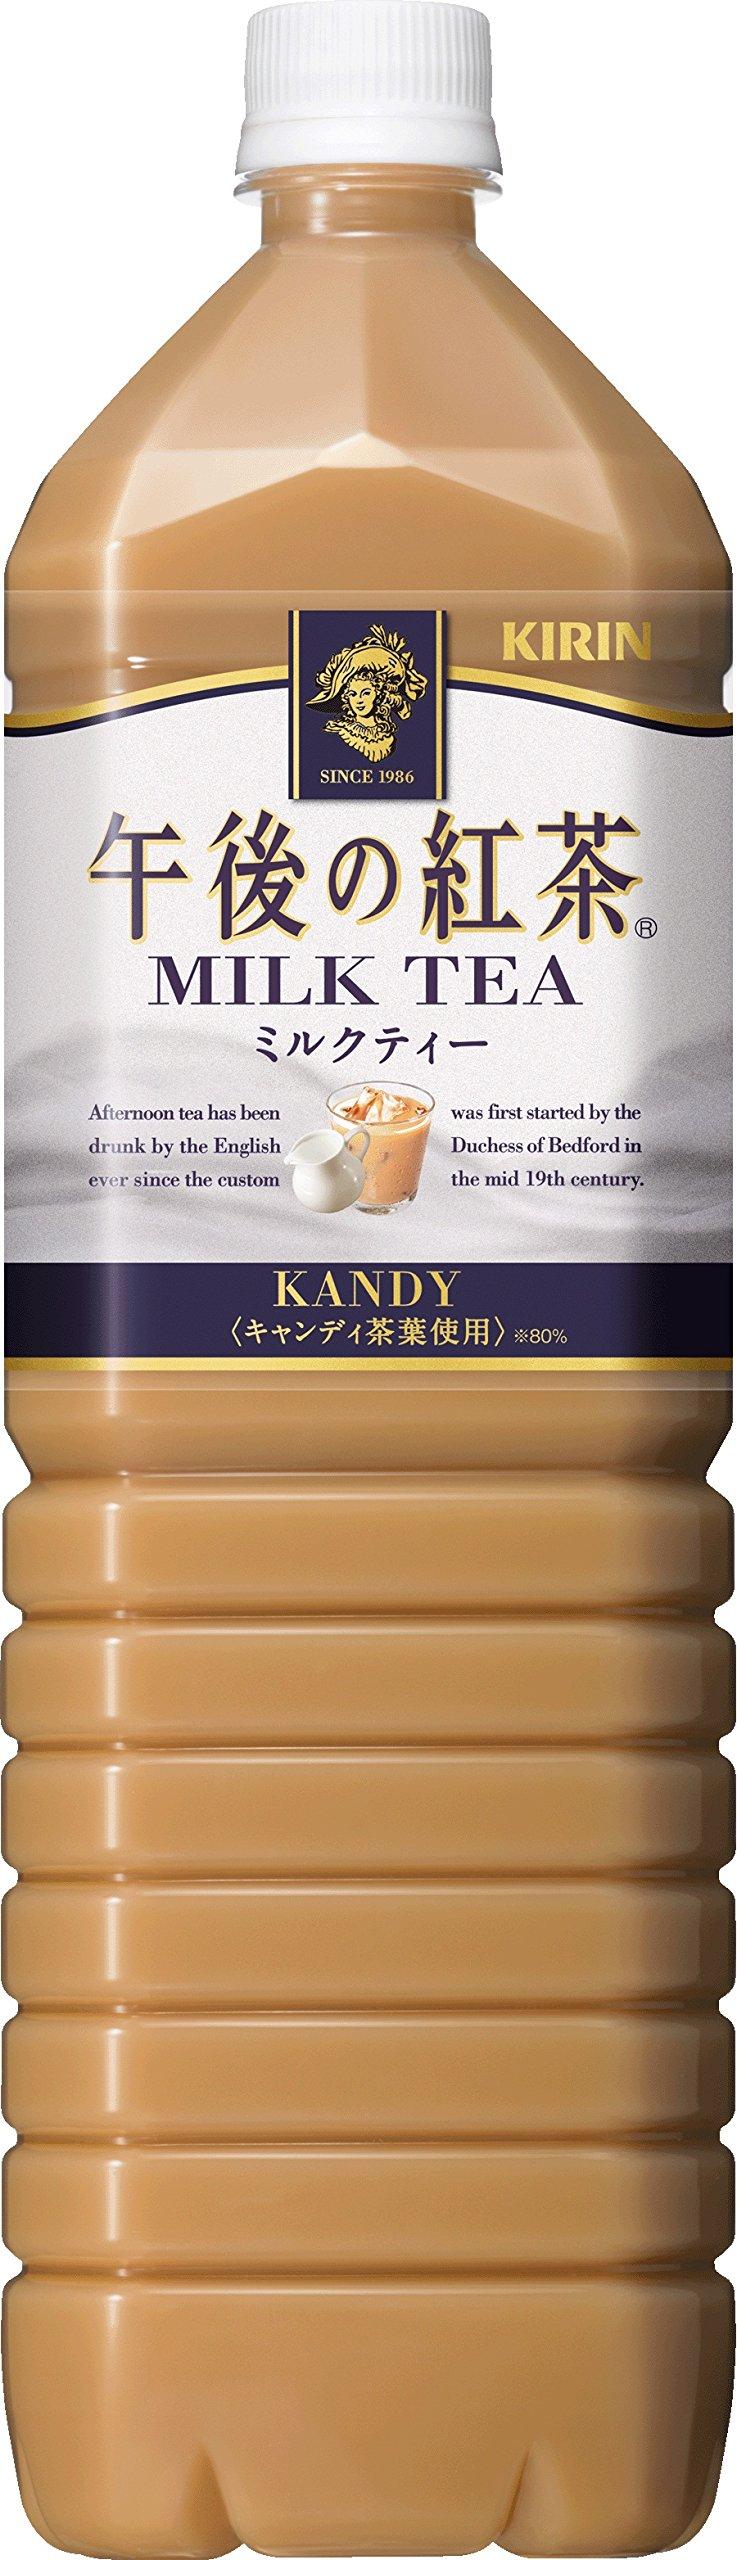 Kirin afternoon tea milk tea 1500ml ~ 8 this